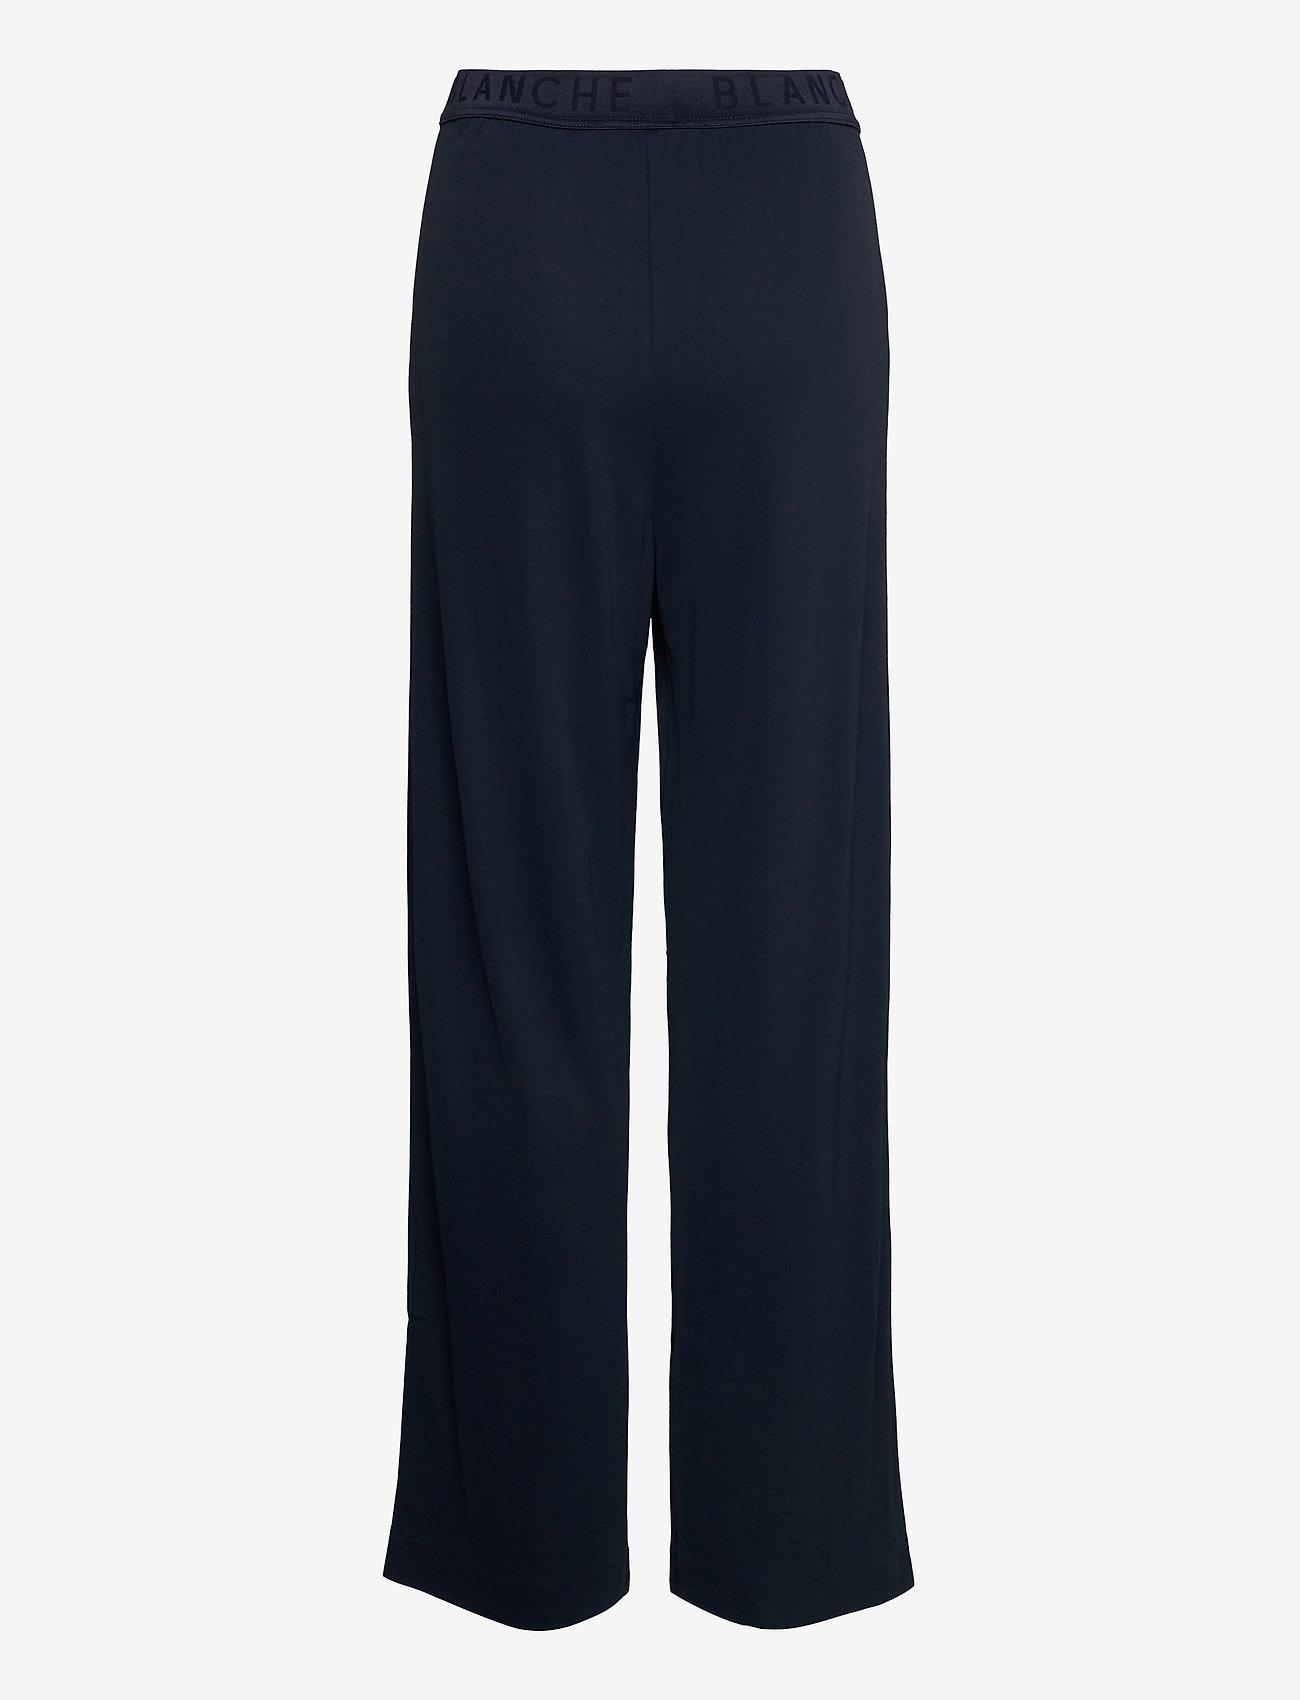 Blanche - Carisi Pants - sale - navy - 1